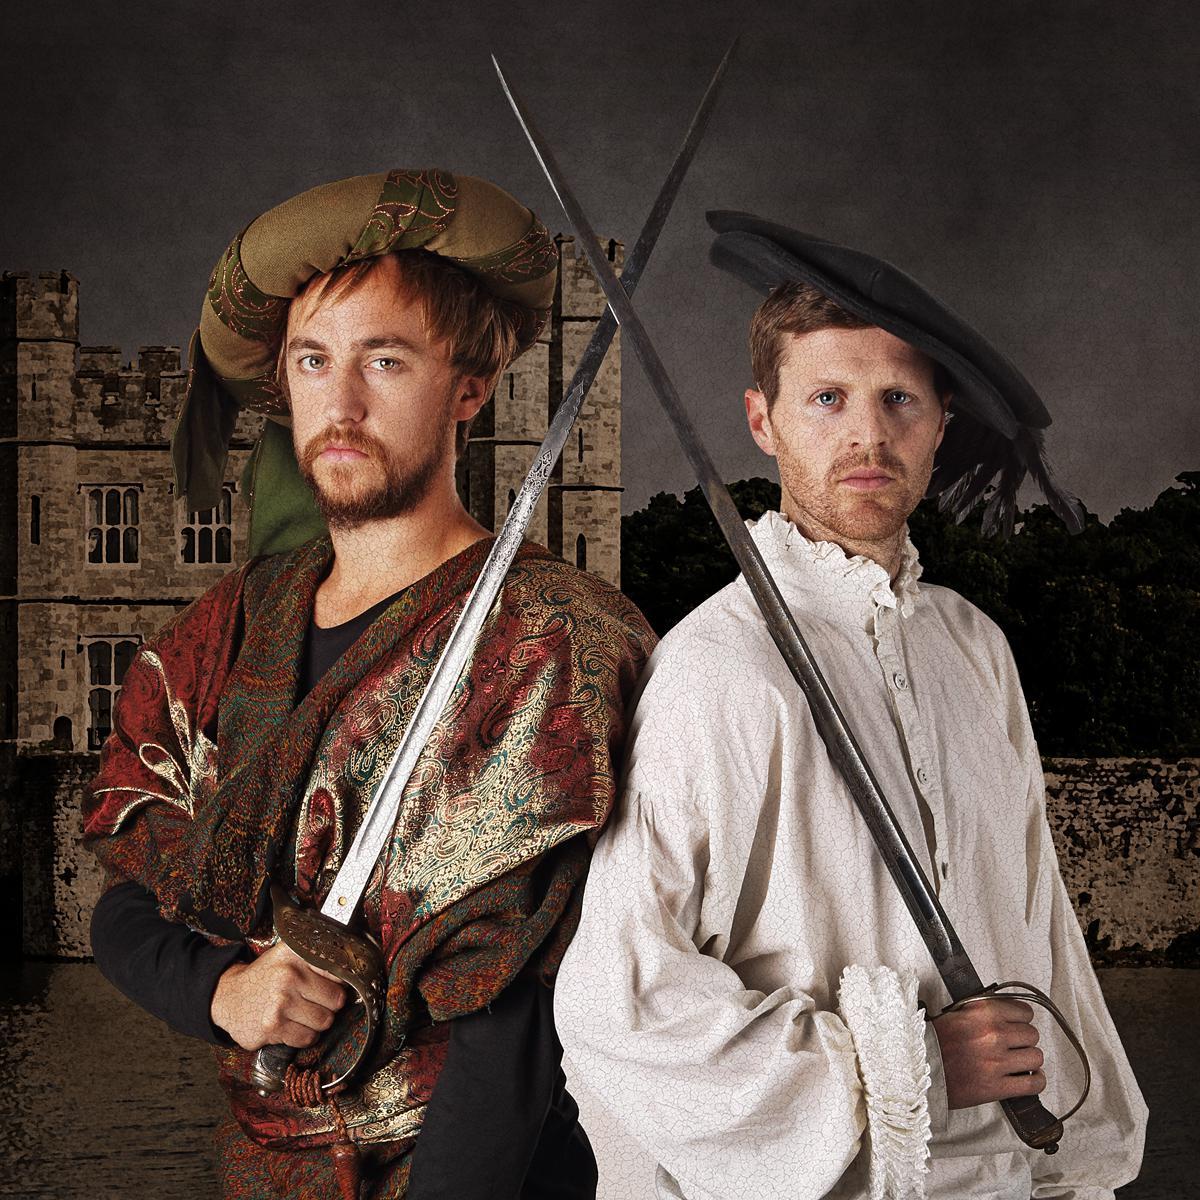 Creative Portrait of Christopher Barrett & Luke Taylor by Julian Hanford for Shots Magazine